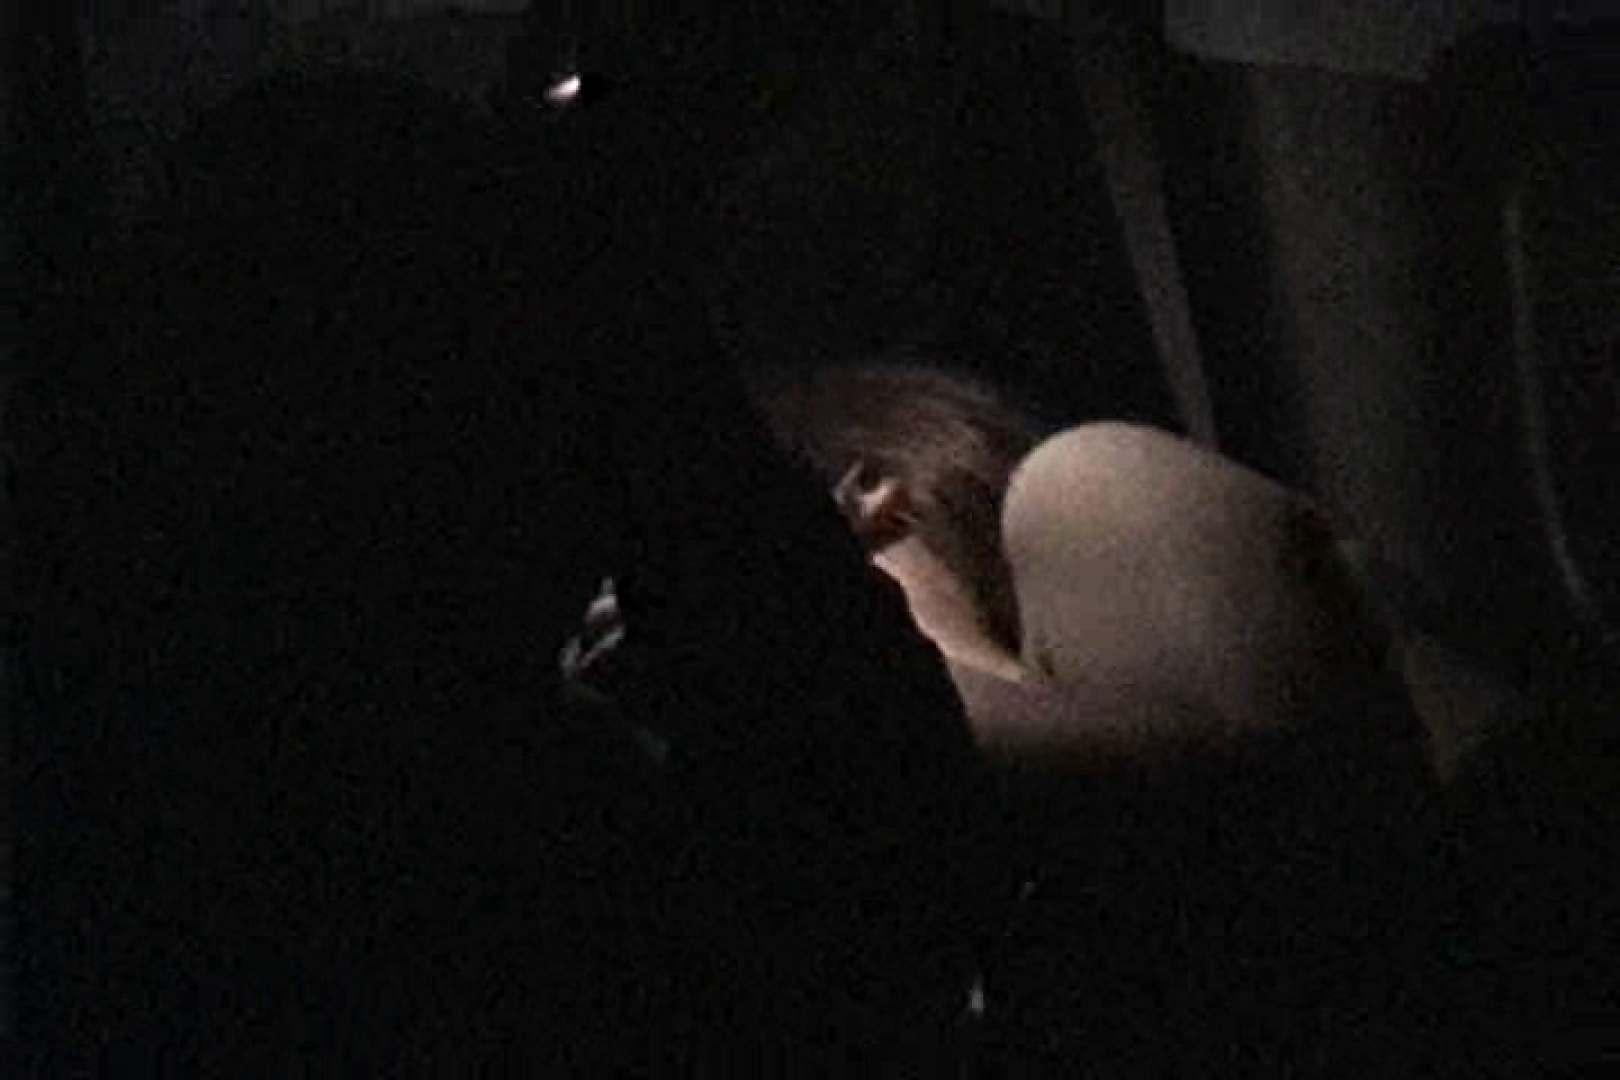 充血監督の深夜の運動会Vol.29 美乳 オメコ無修正動画無料 85pic 18